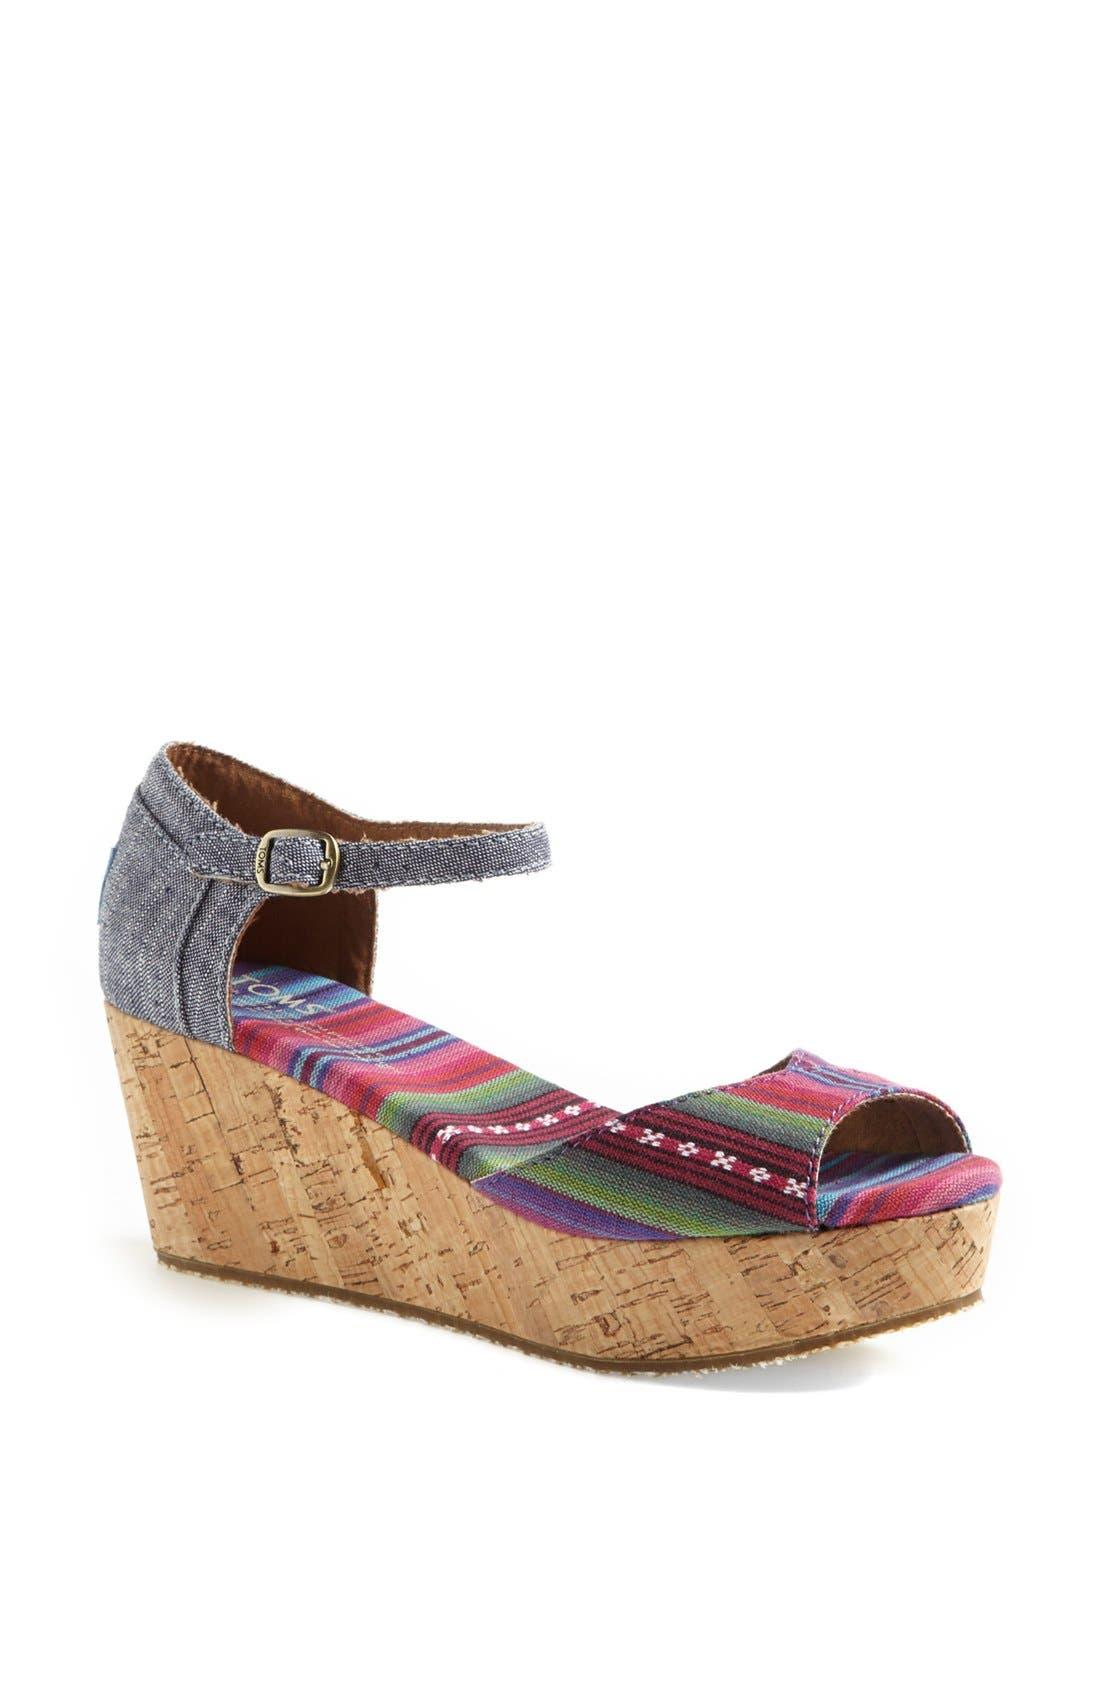 Alternate Image 1 Selected - TOMS Platform Wedge Sandal (Women)